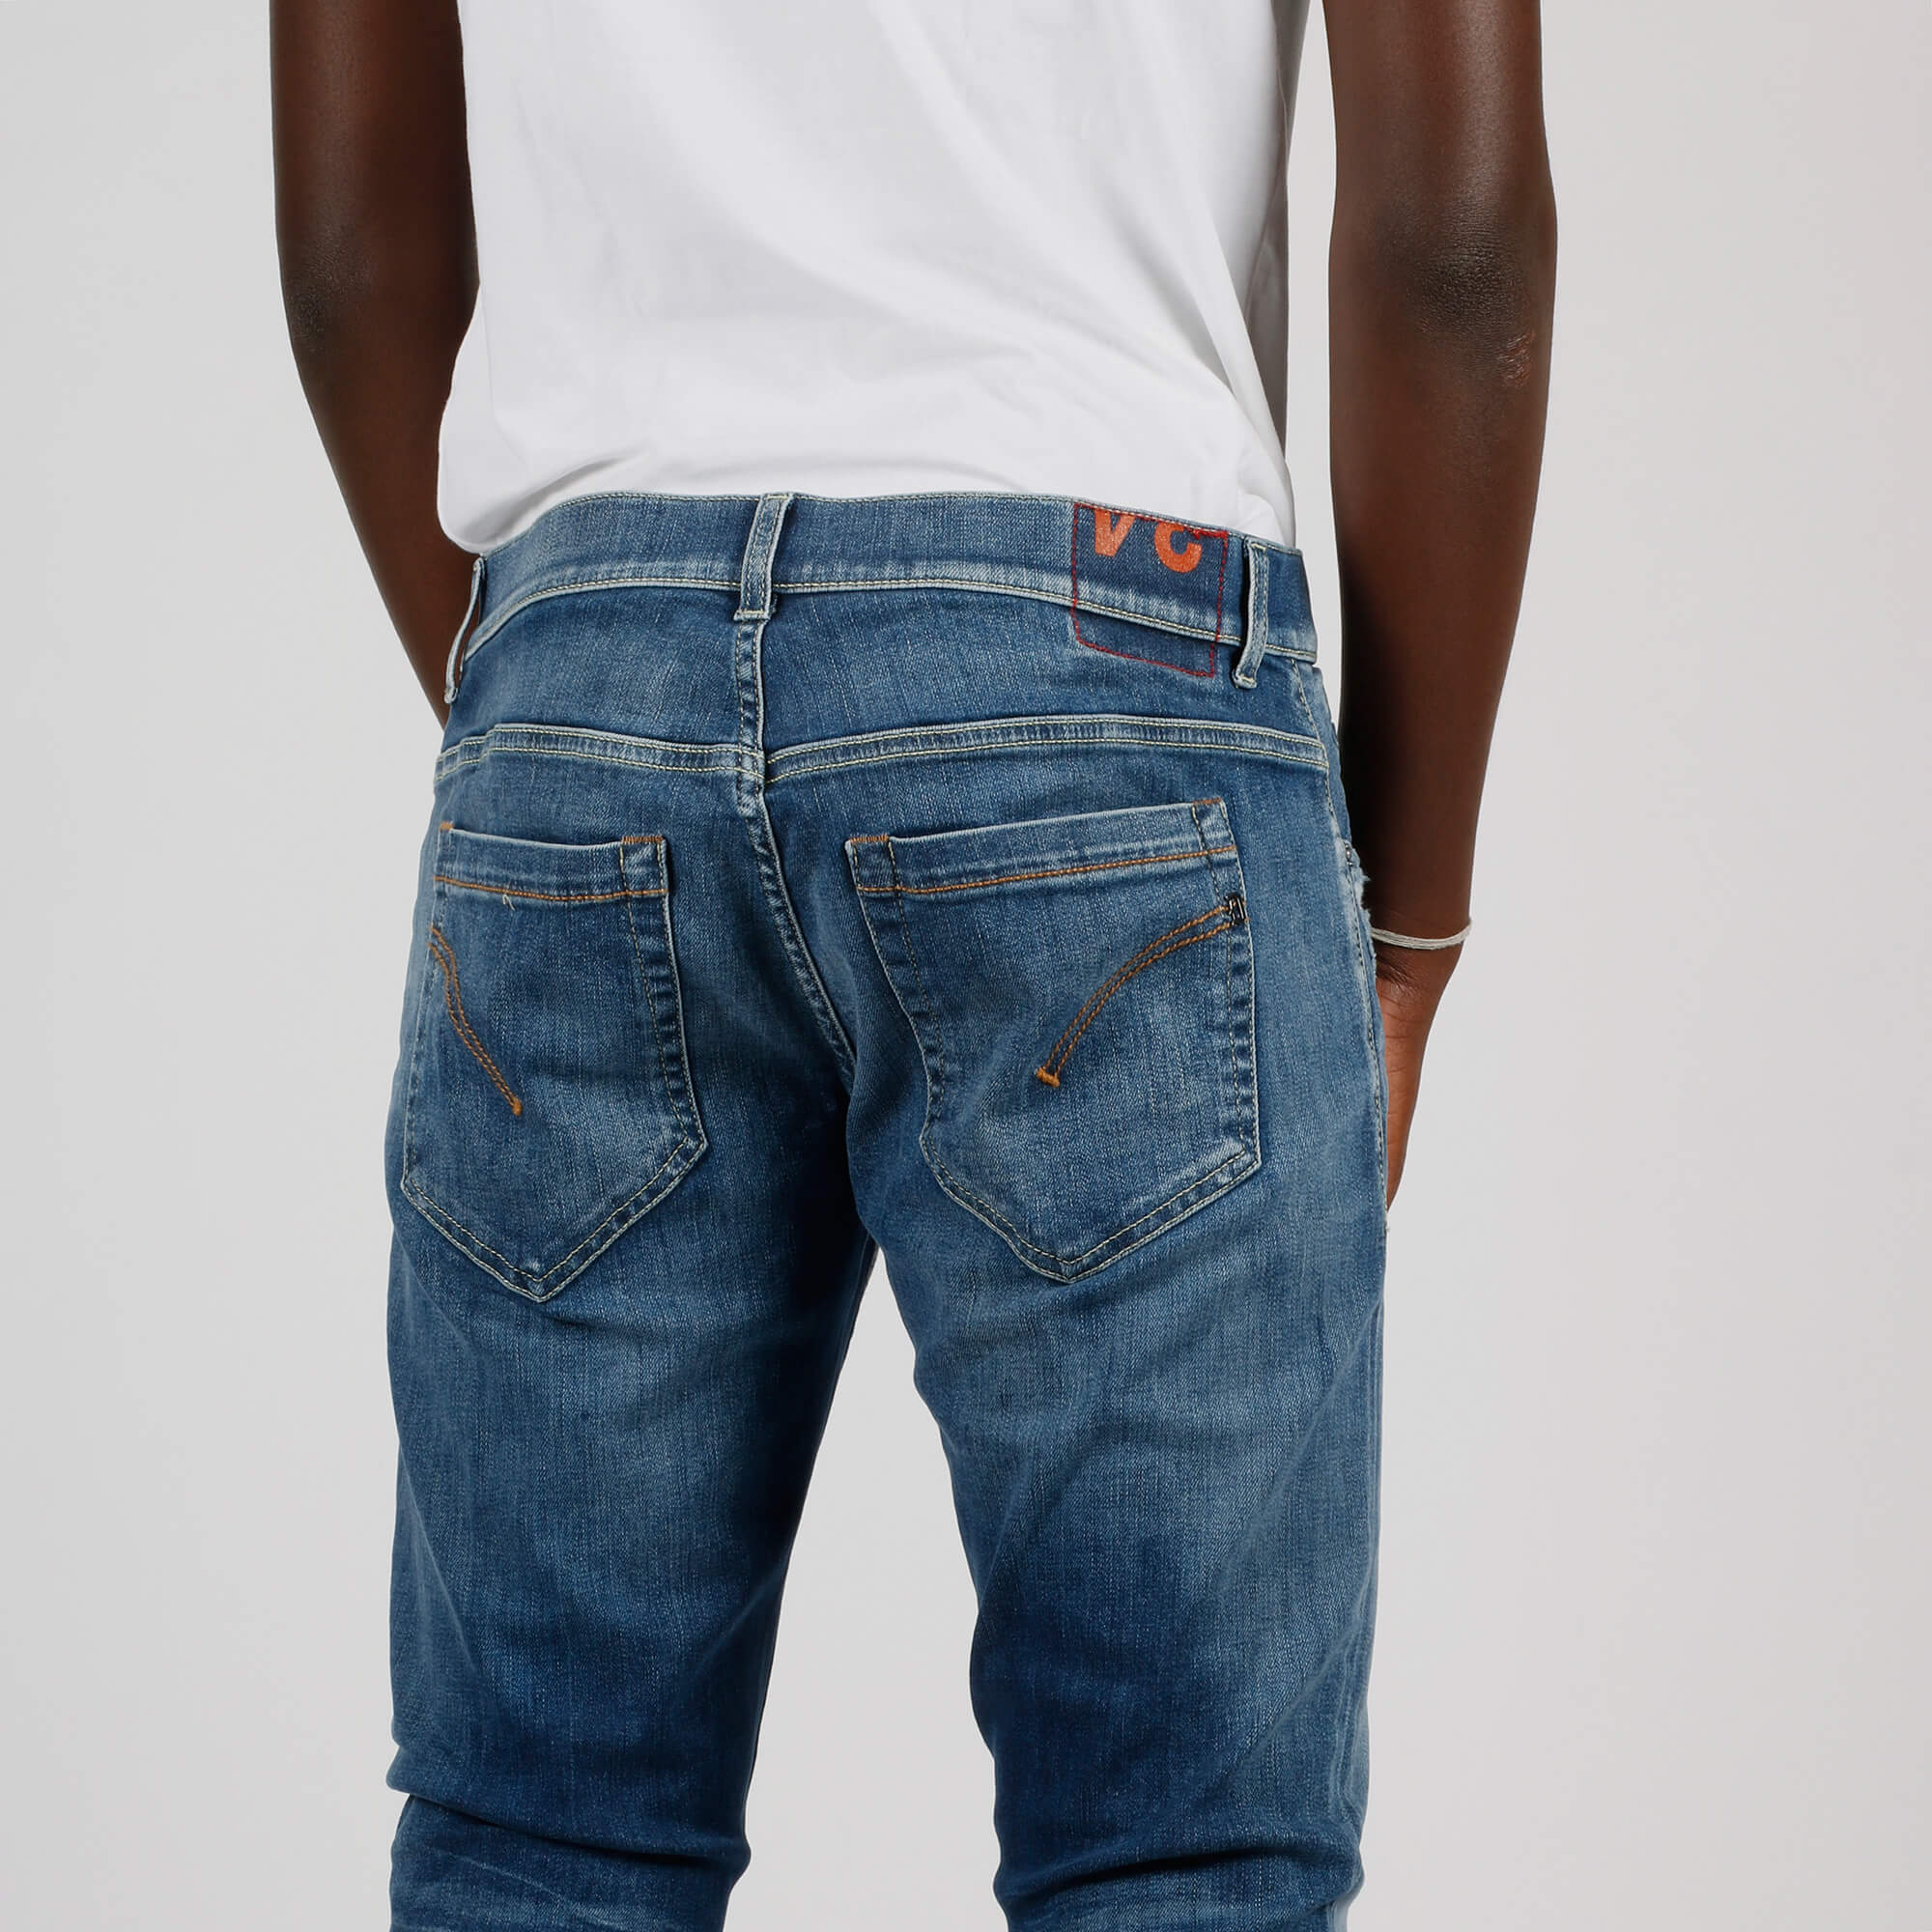 Pantalone george rotture tasca - Denim